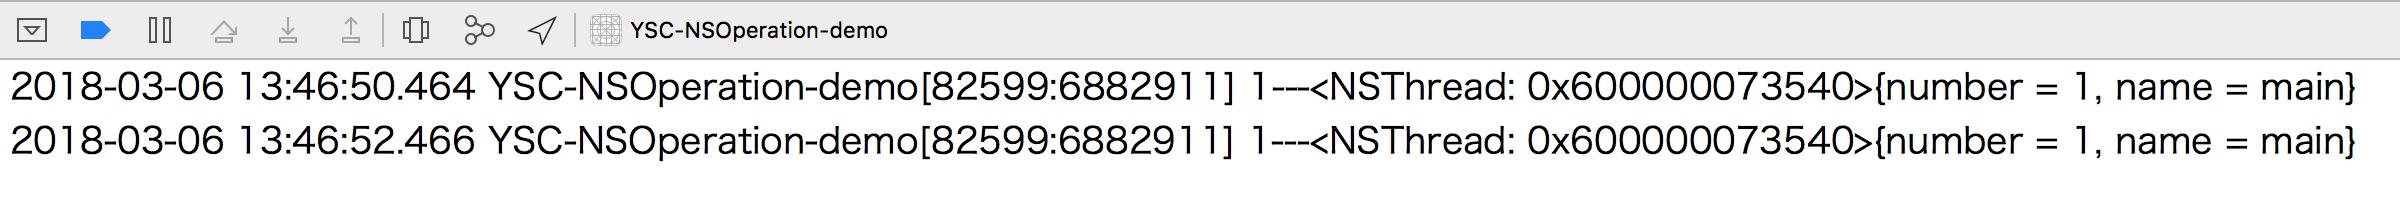 1877784-3ed047566df45382.png